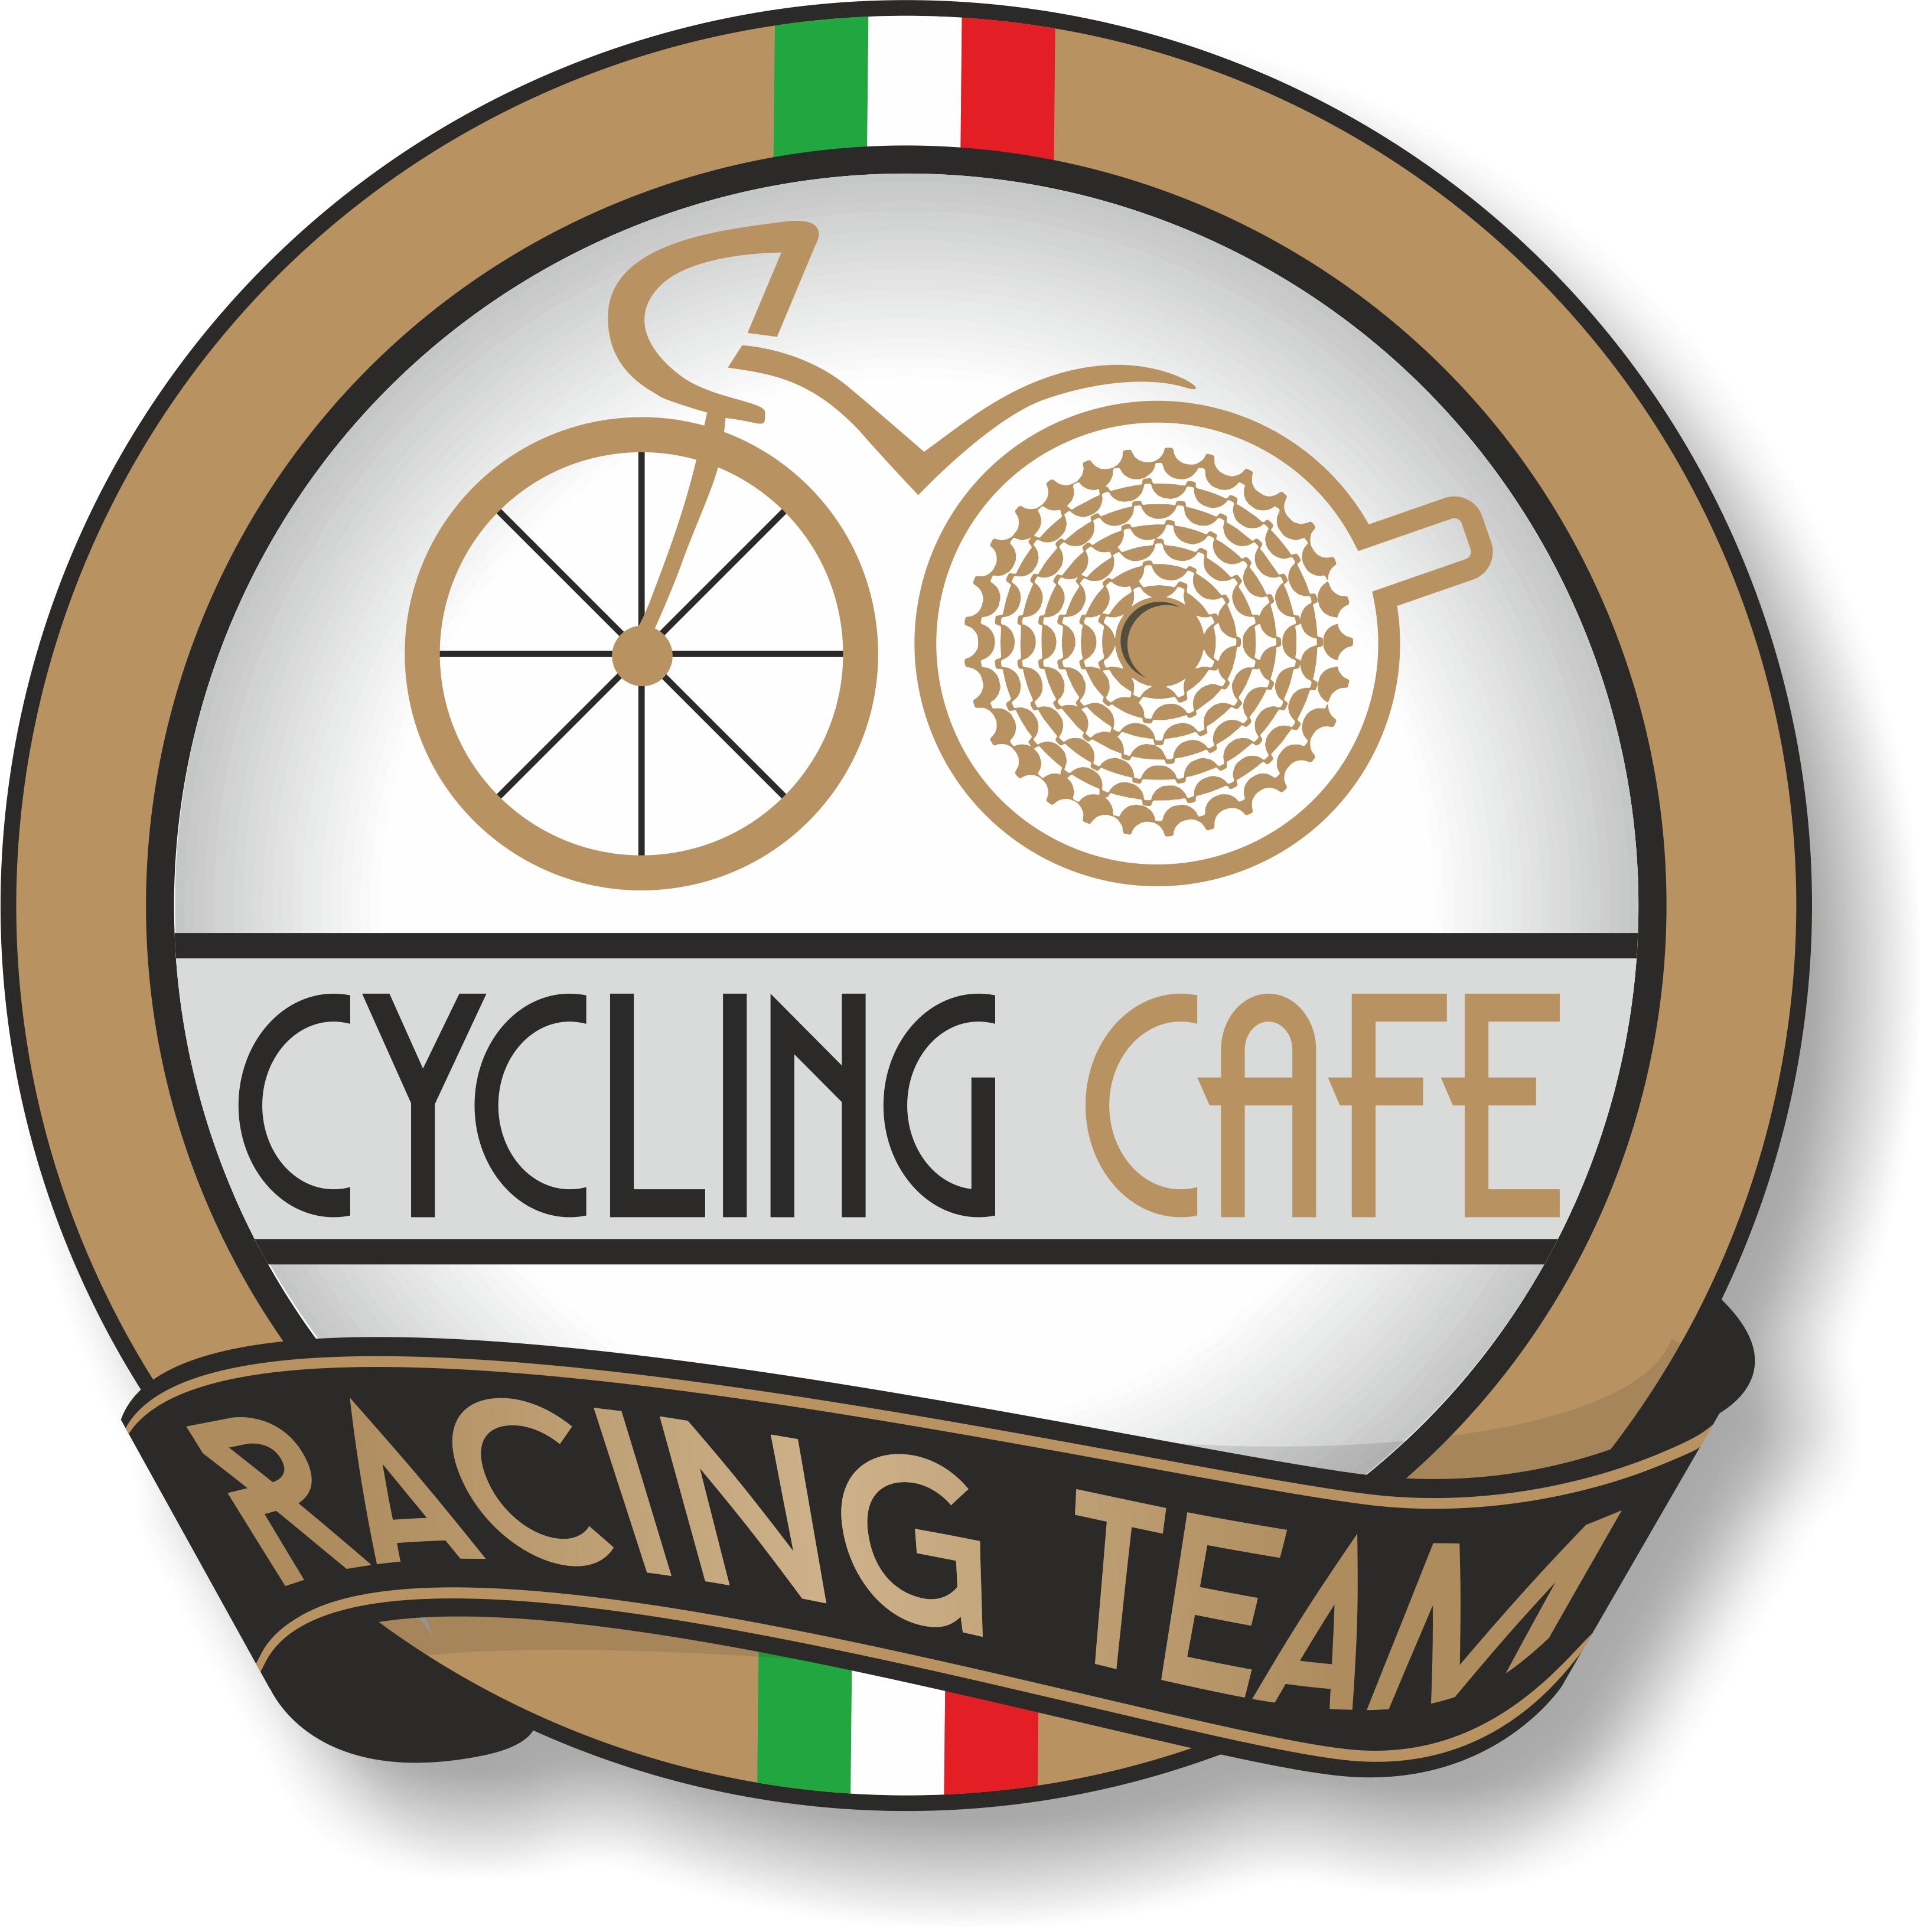 Cycling Cafè Racing